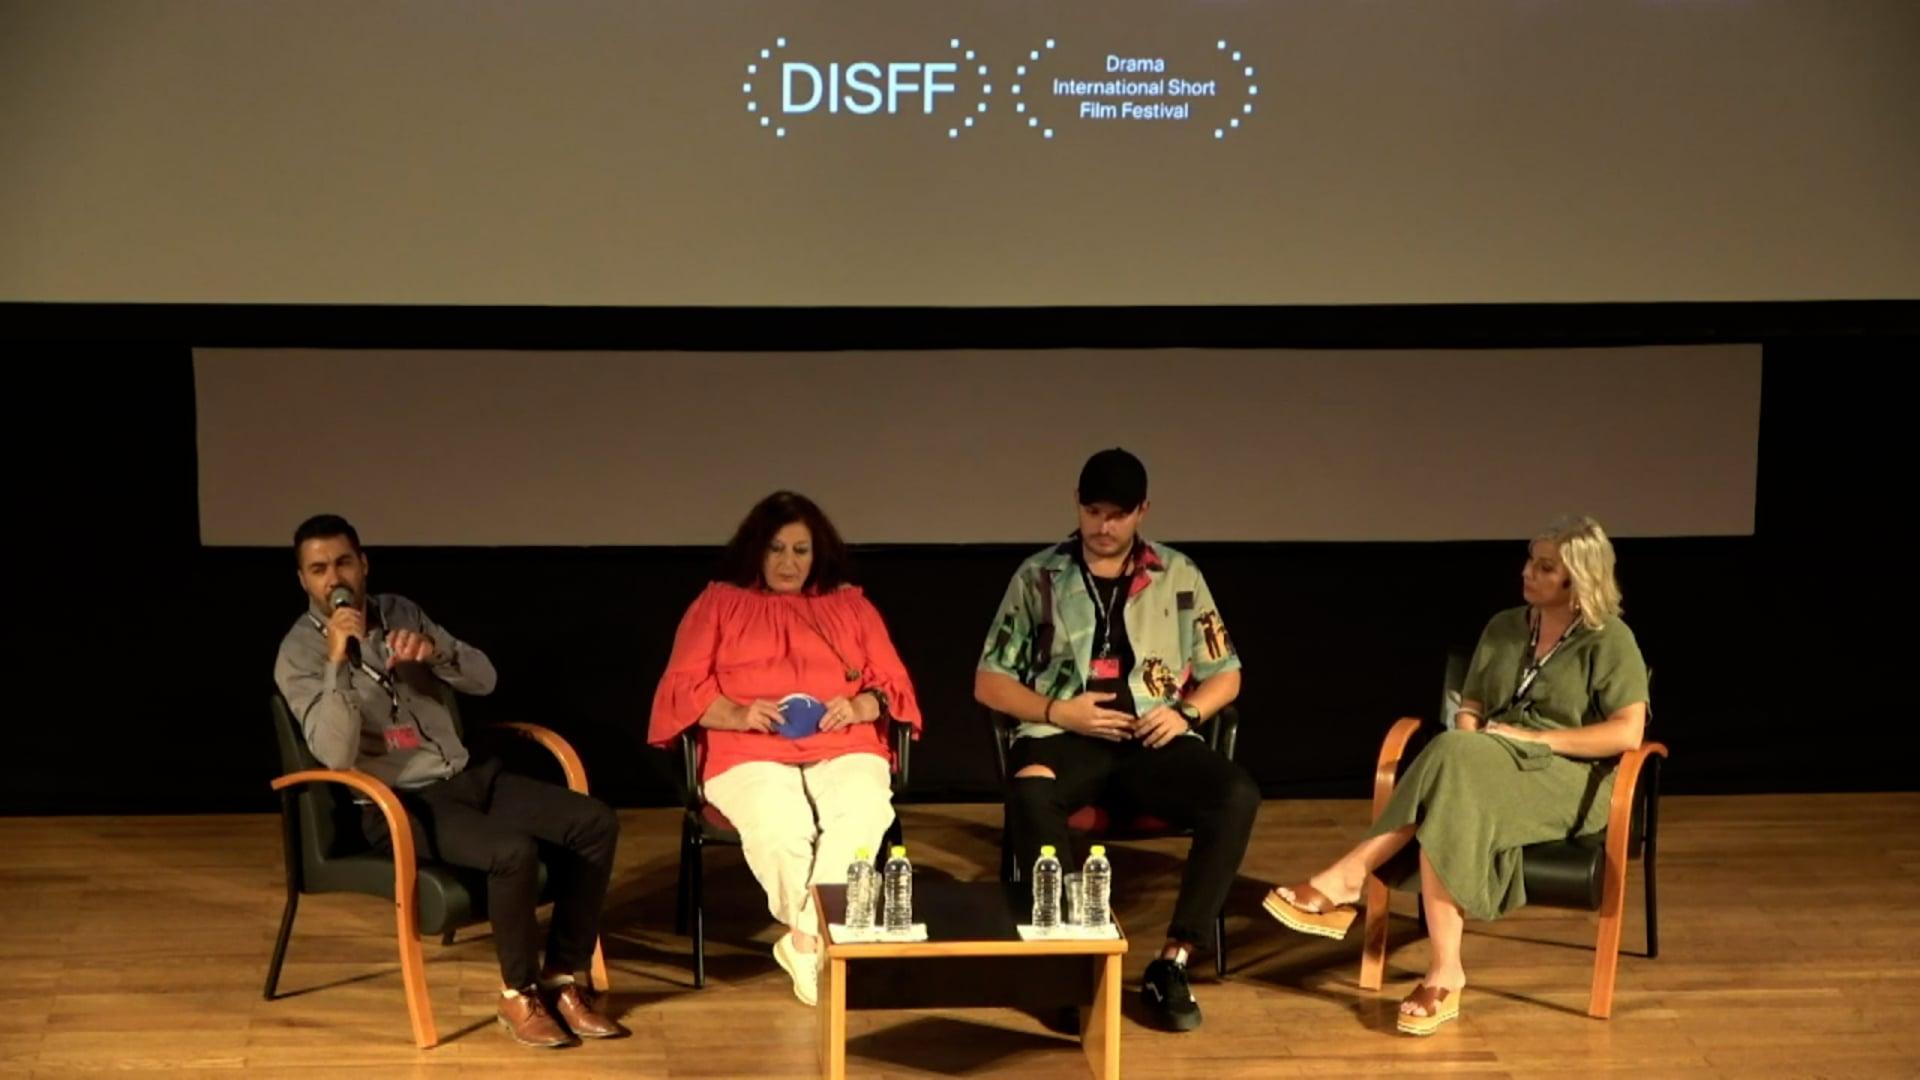 CINEMATHERAPY - DENISE NIKOLAKOU | WED 15/9, 20:00